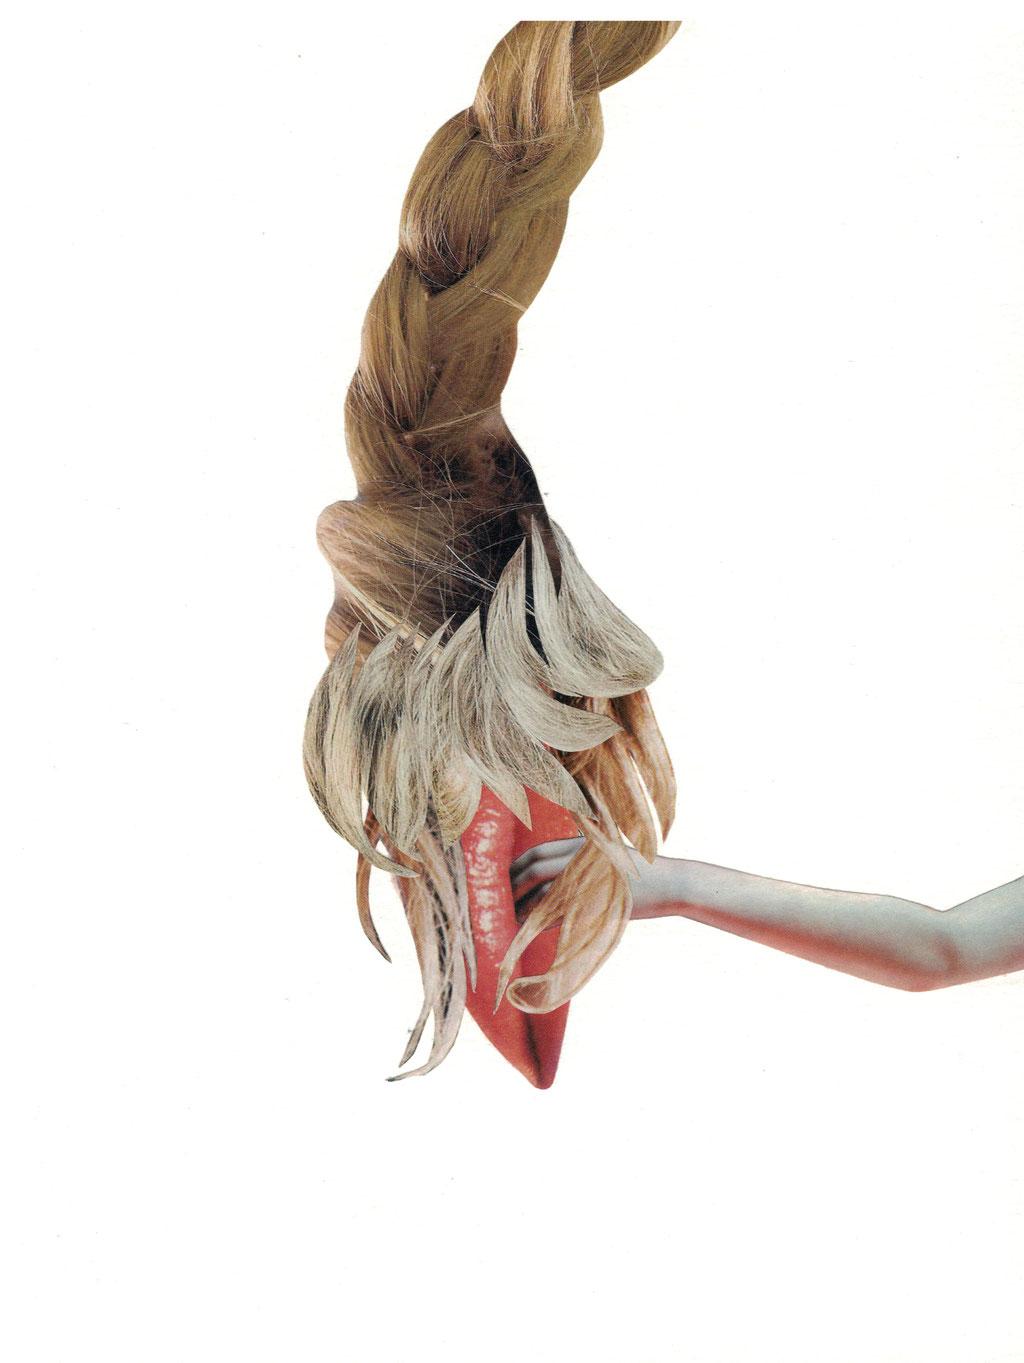 zonder titel, 14,5 x 19,5 cm, 2017